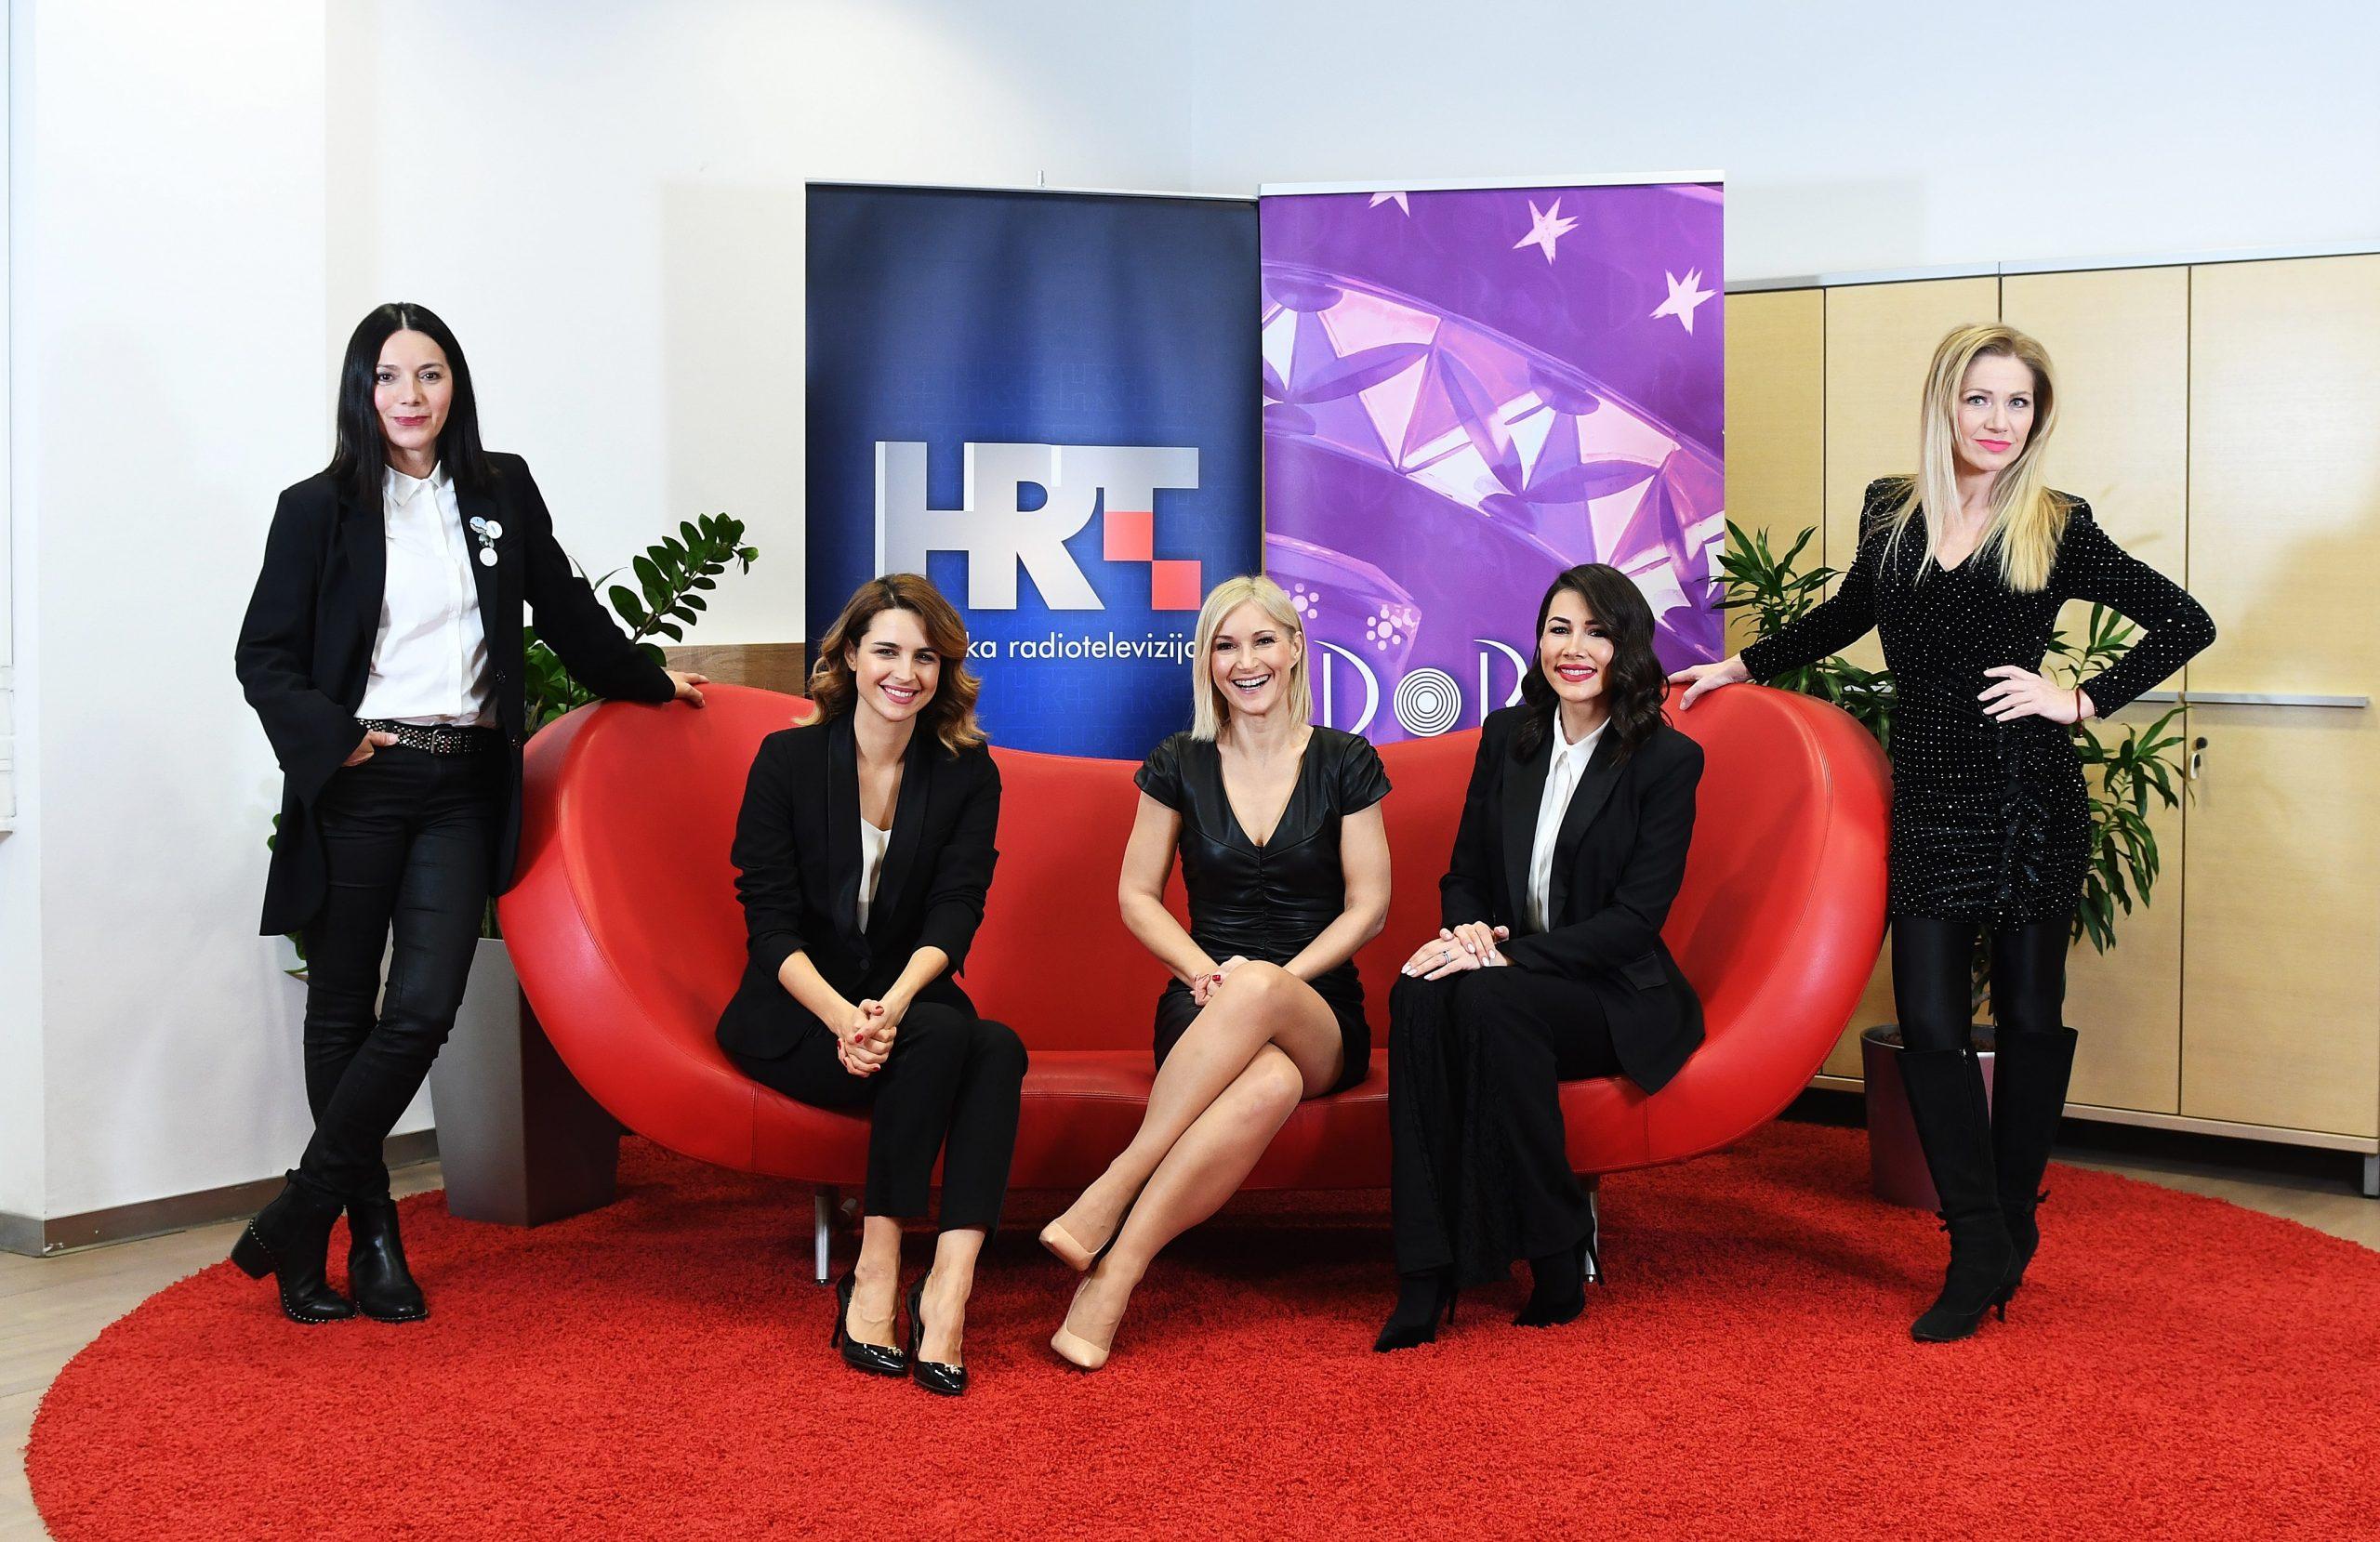 Foto: RENATO BRANĐOLICA/HRT